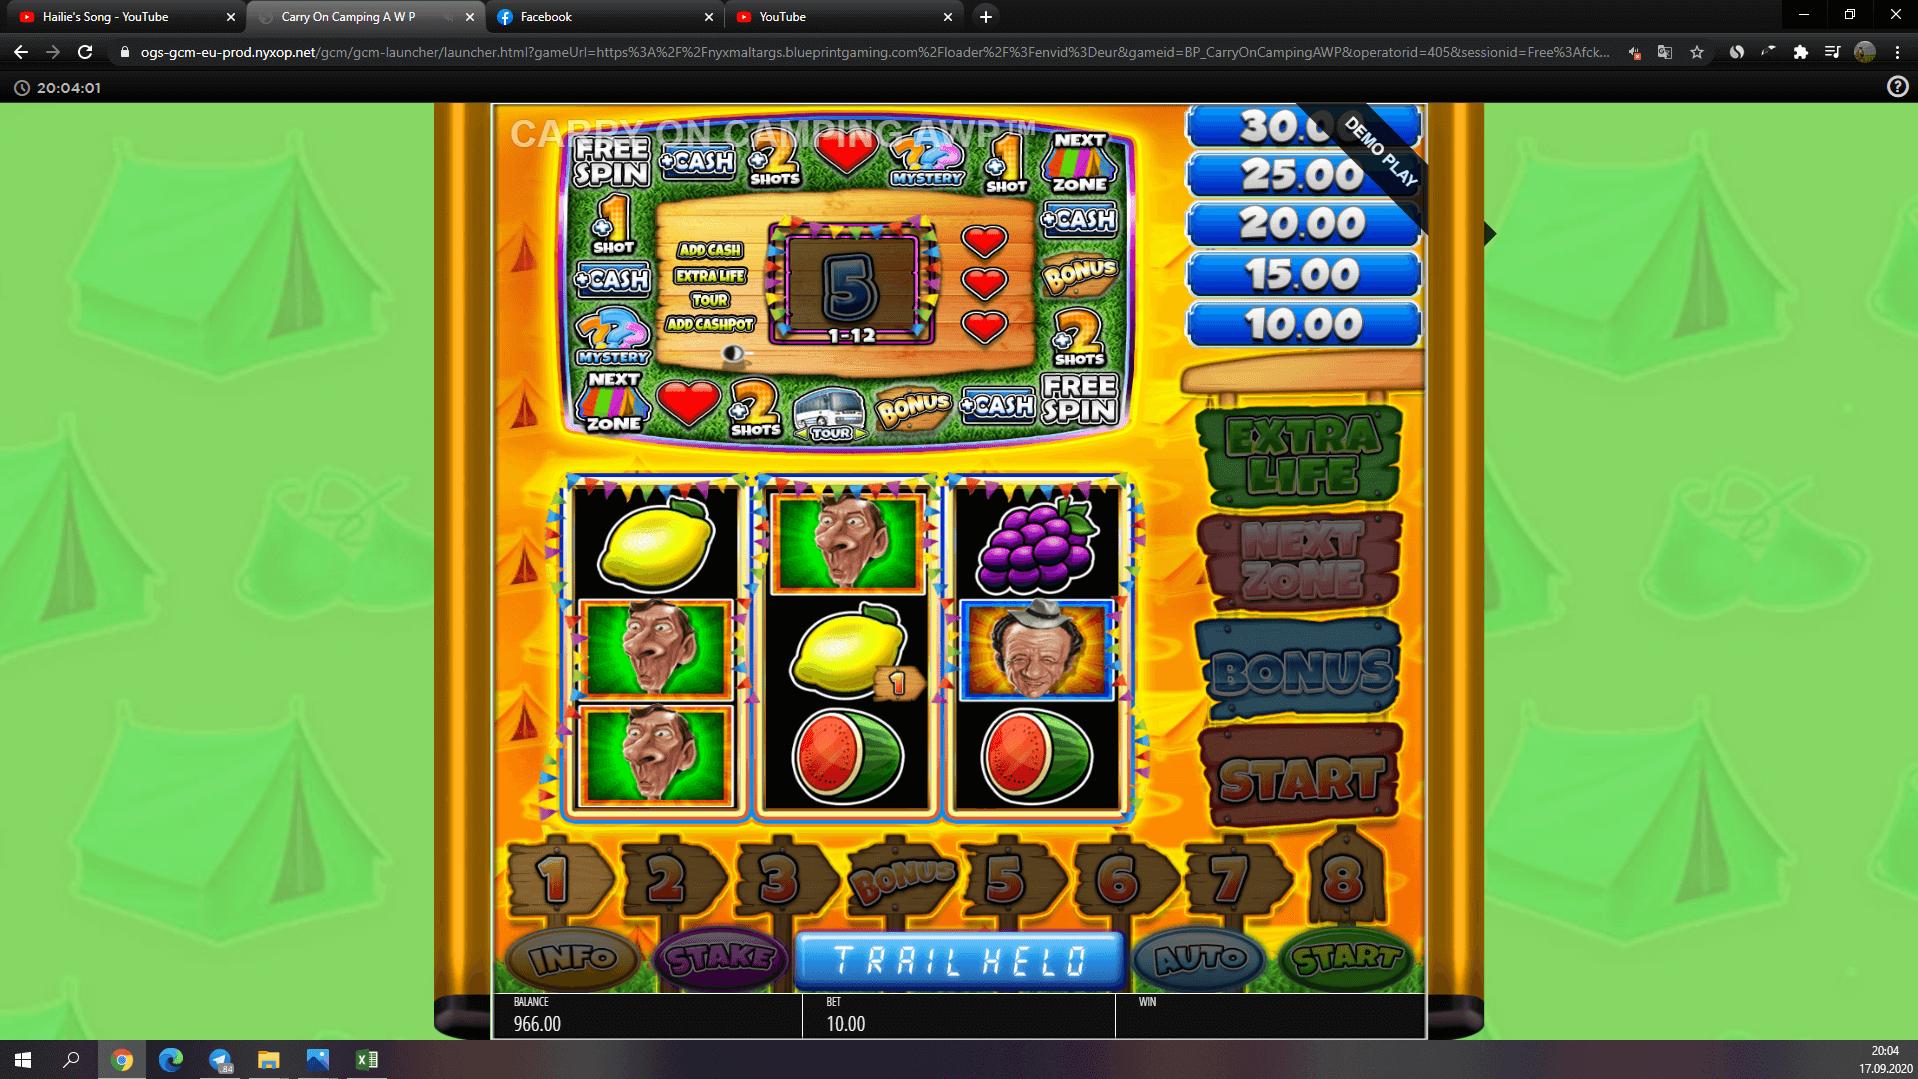 Carry On Camping Pub Fruit Slot Machine